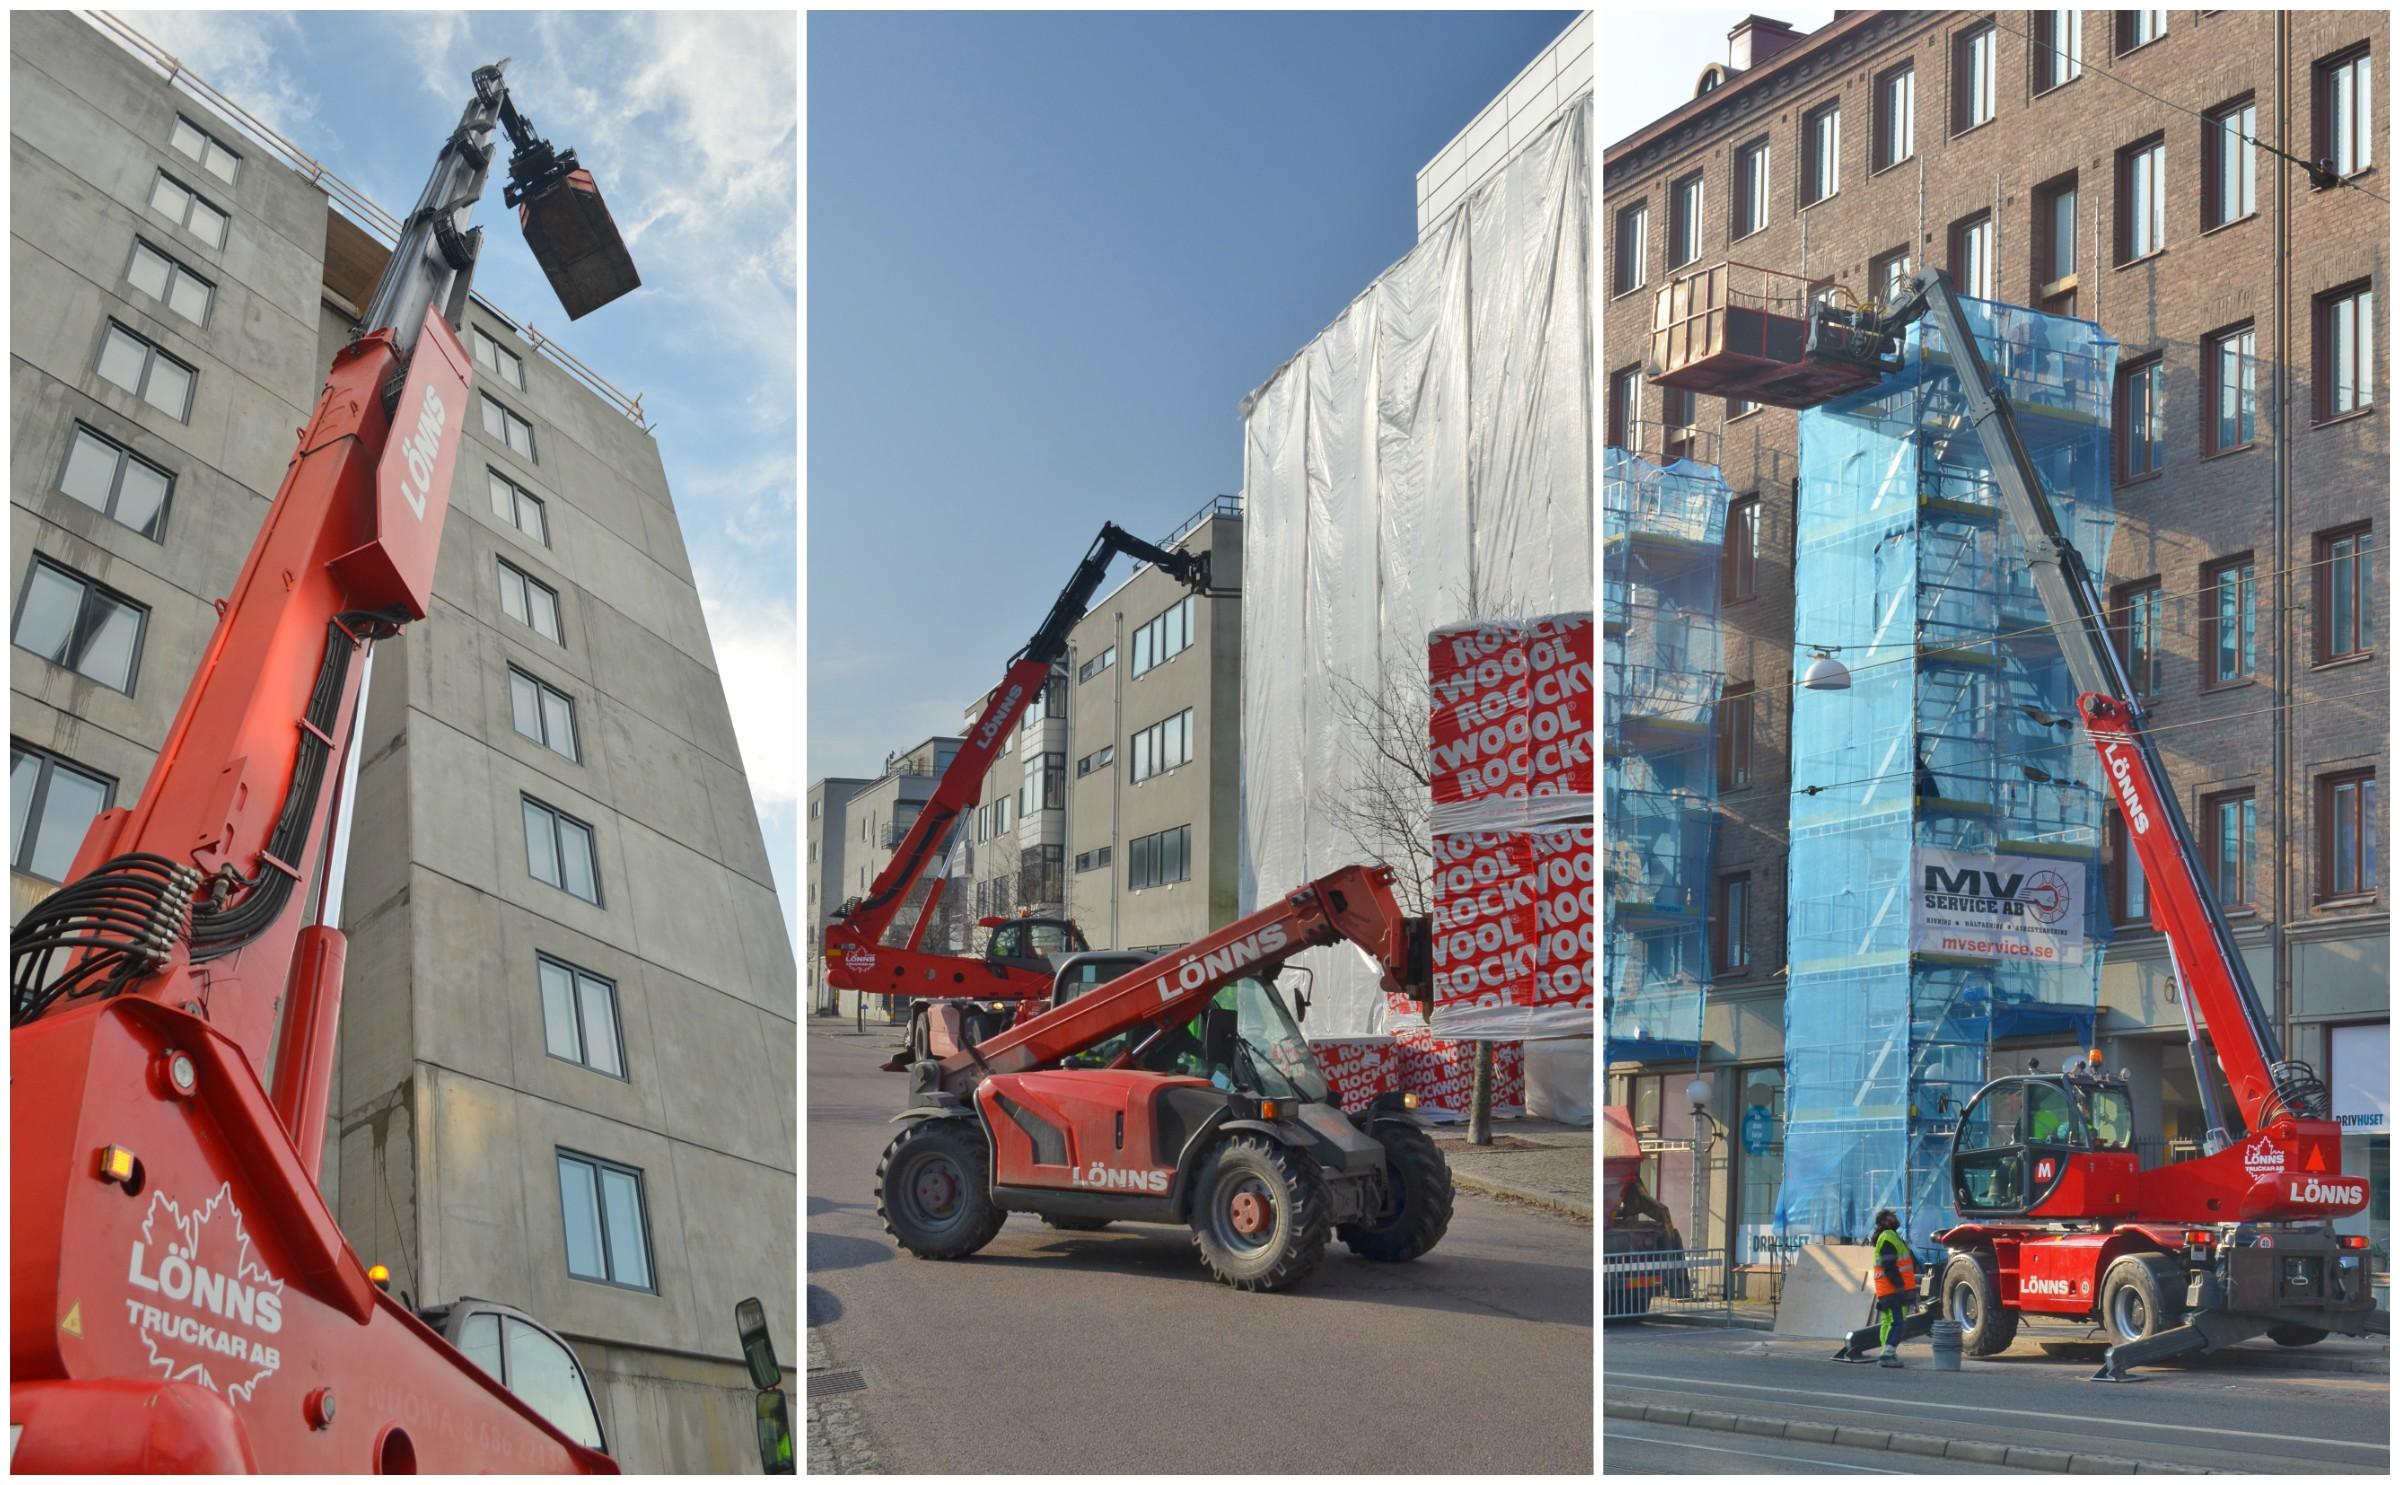 Lyfthjälp Göteborg — Lönns Truckar AB